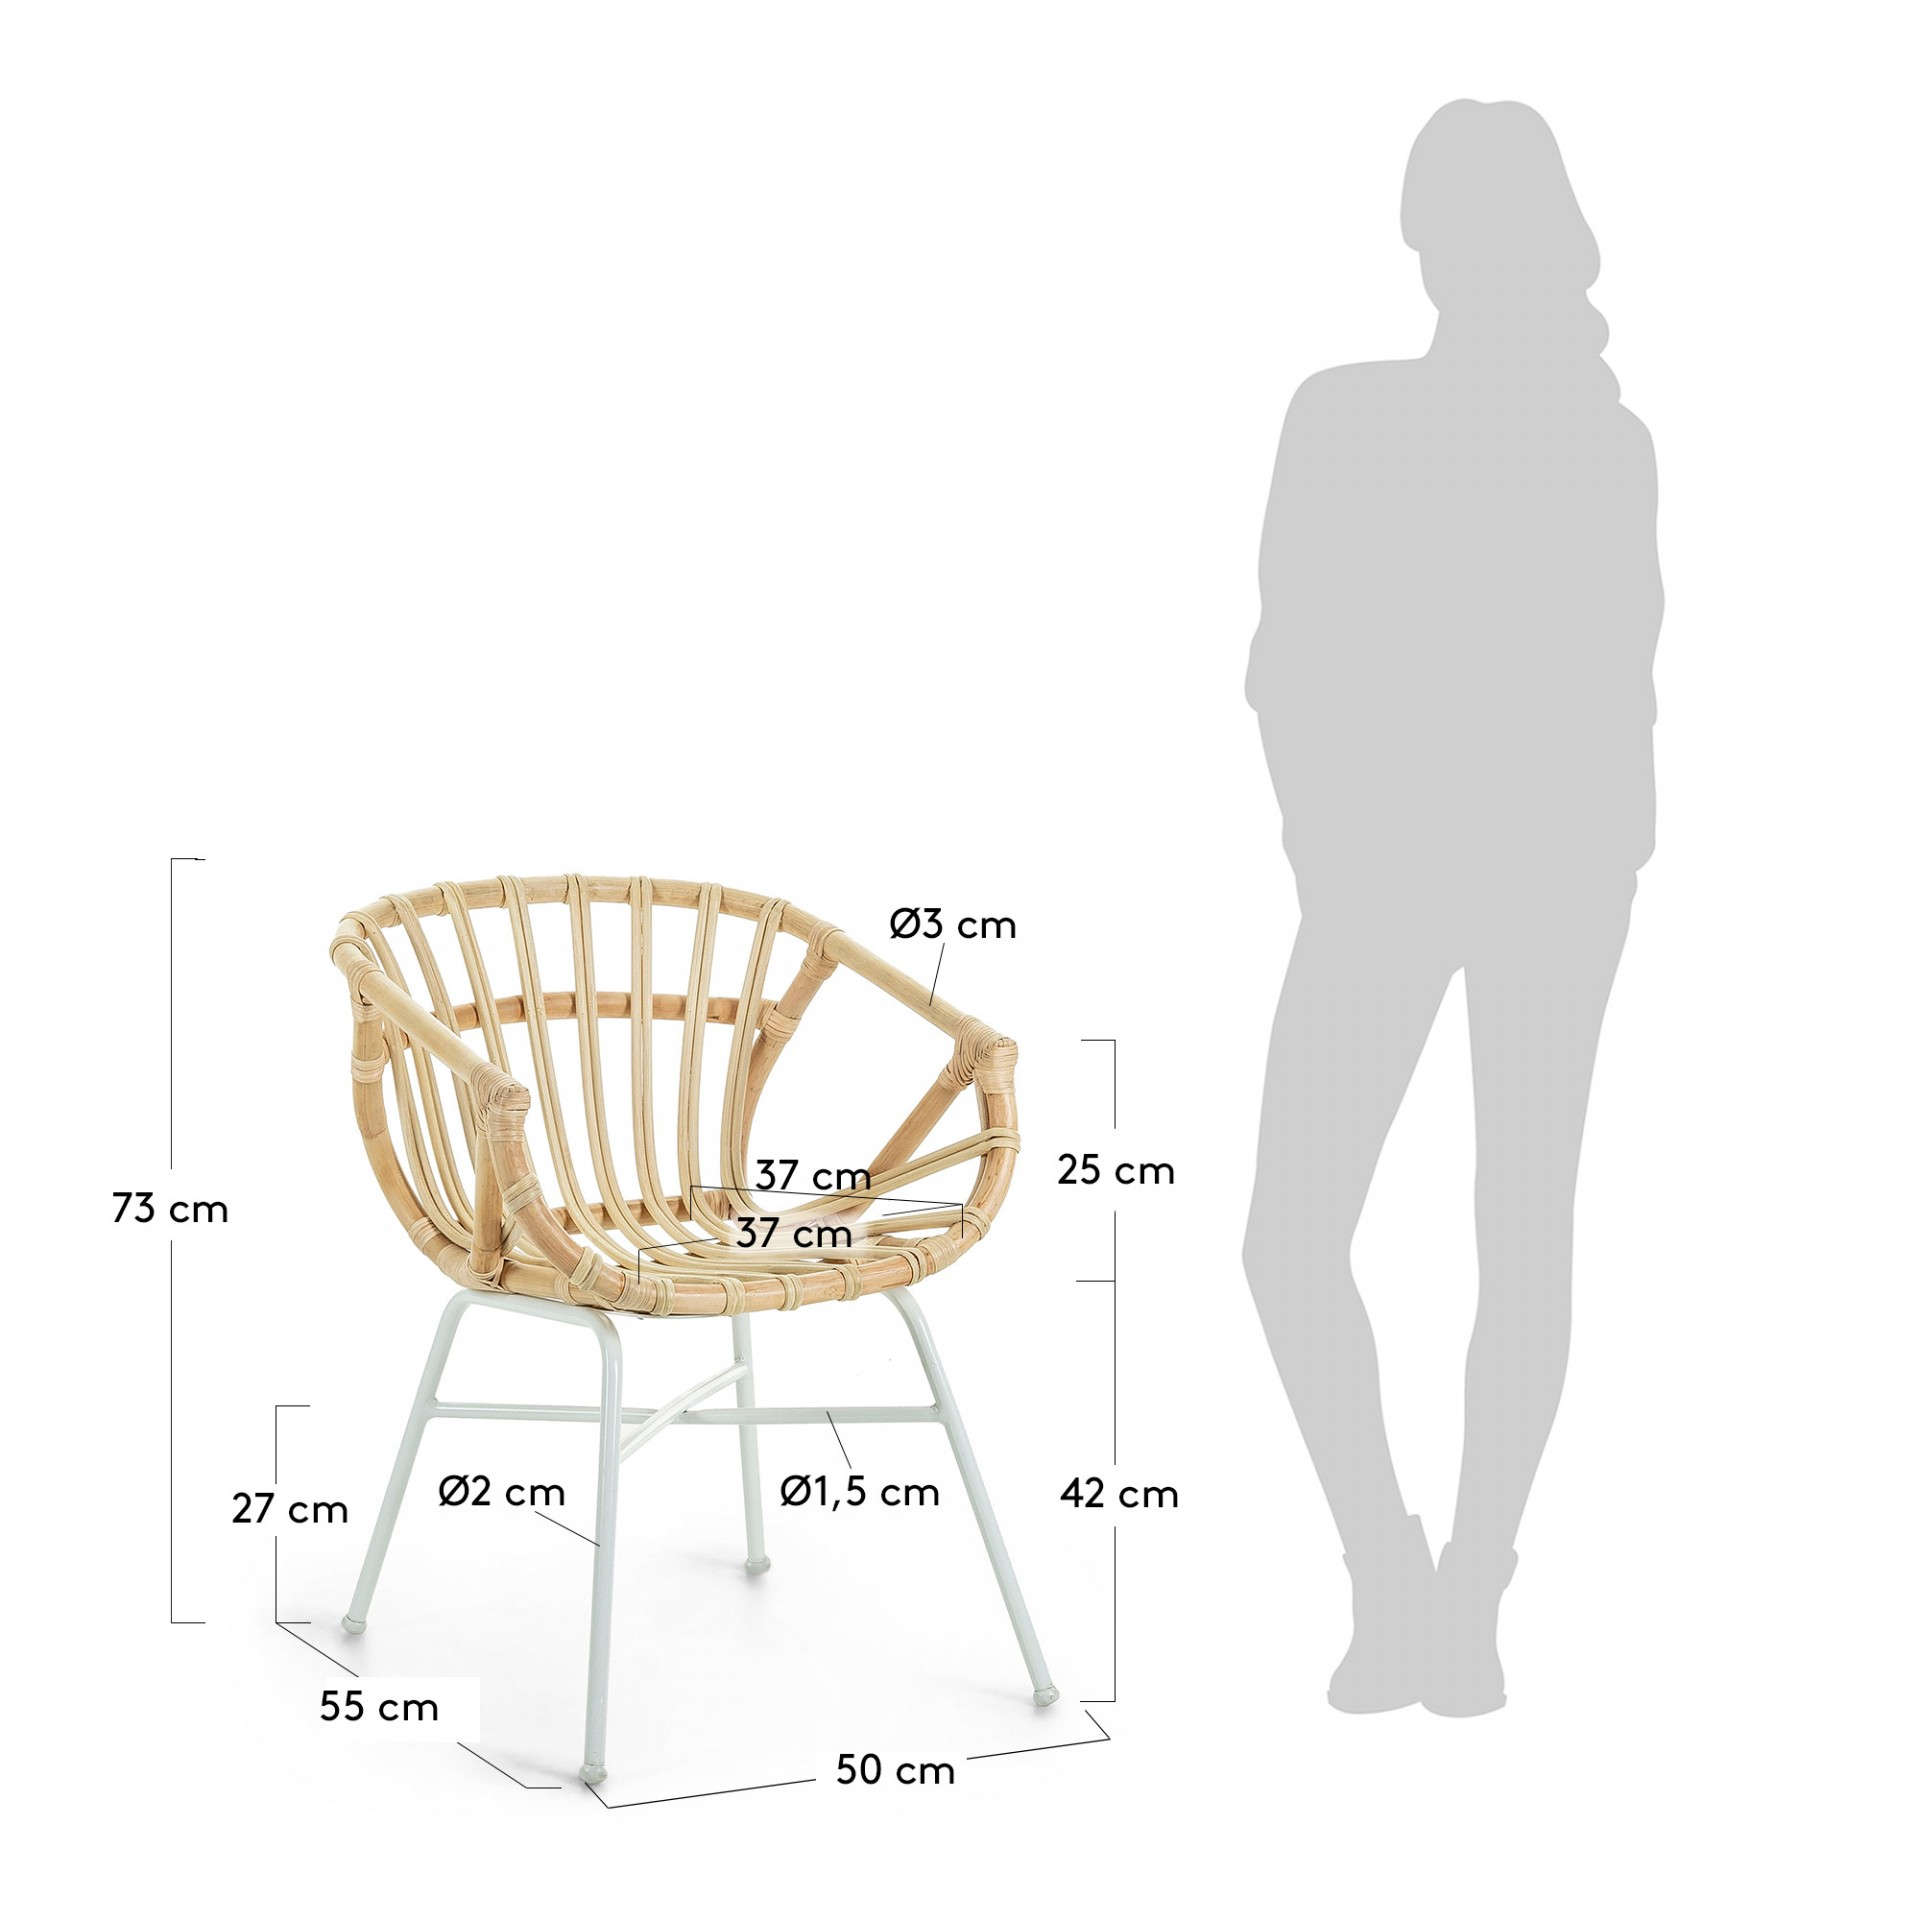 Cadeira Kely, c/braços, vime natural